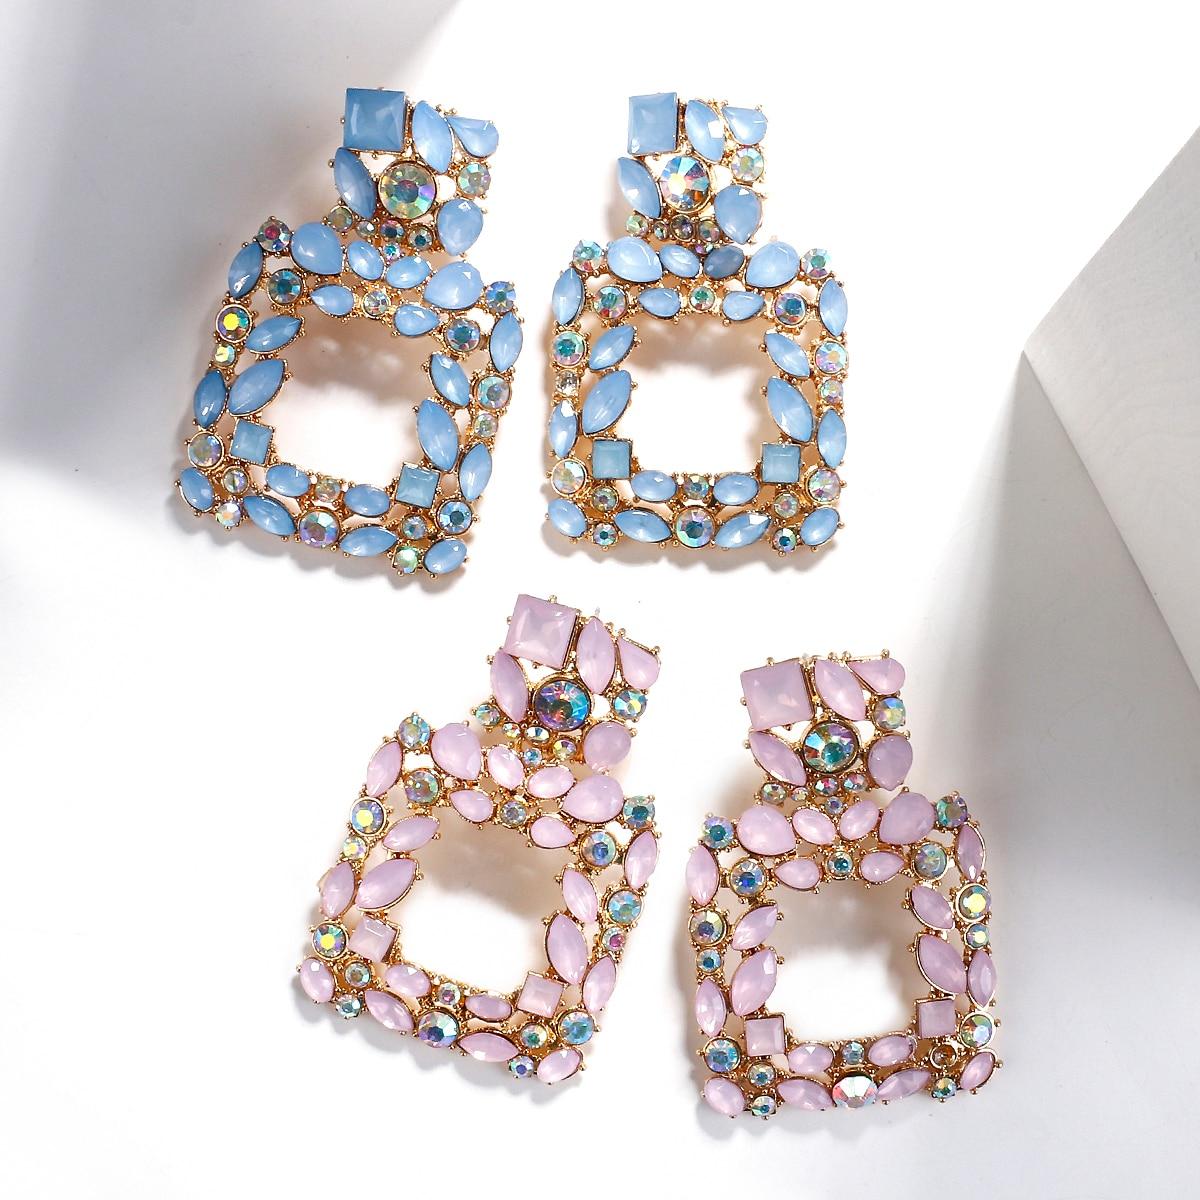 Hanging Rhinestone Statement Earrings for Women Jewelry